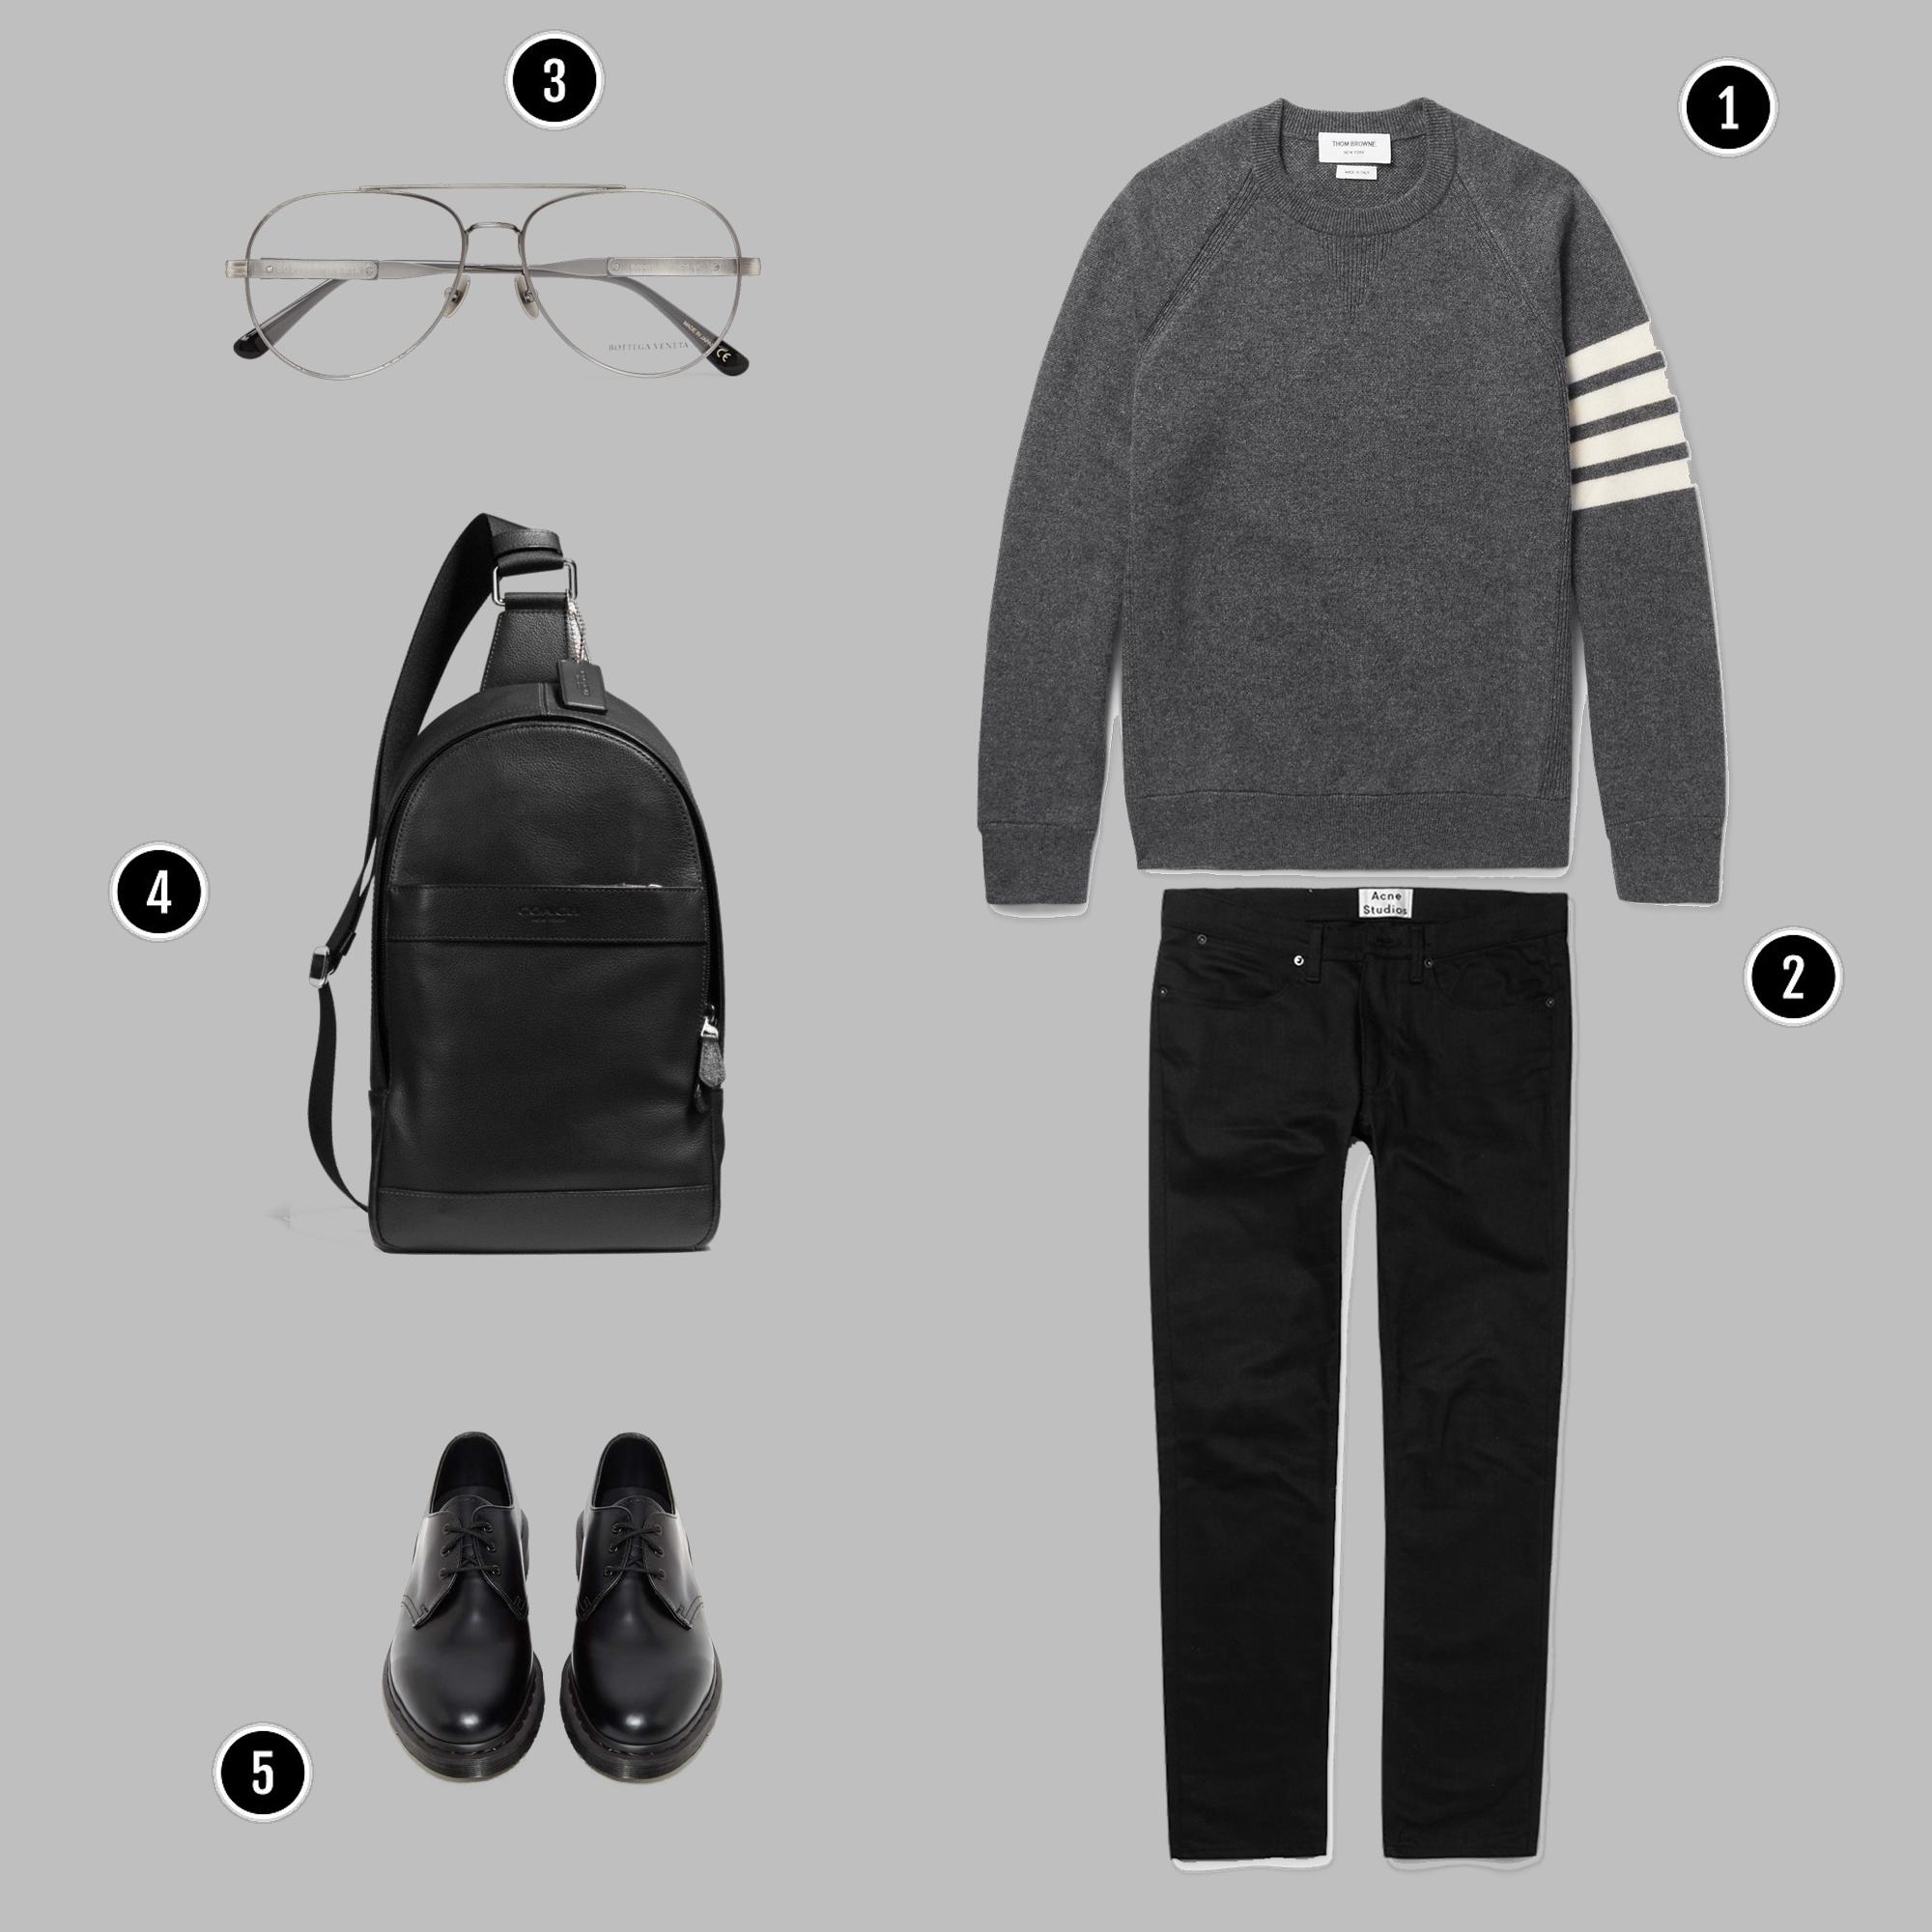 1. Áo: Thom Browne / 2. Quần: Acne / 3. Kính: Bottega veneta / 4. Túi: Coach / 5. Giày: Dr martens